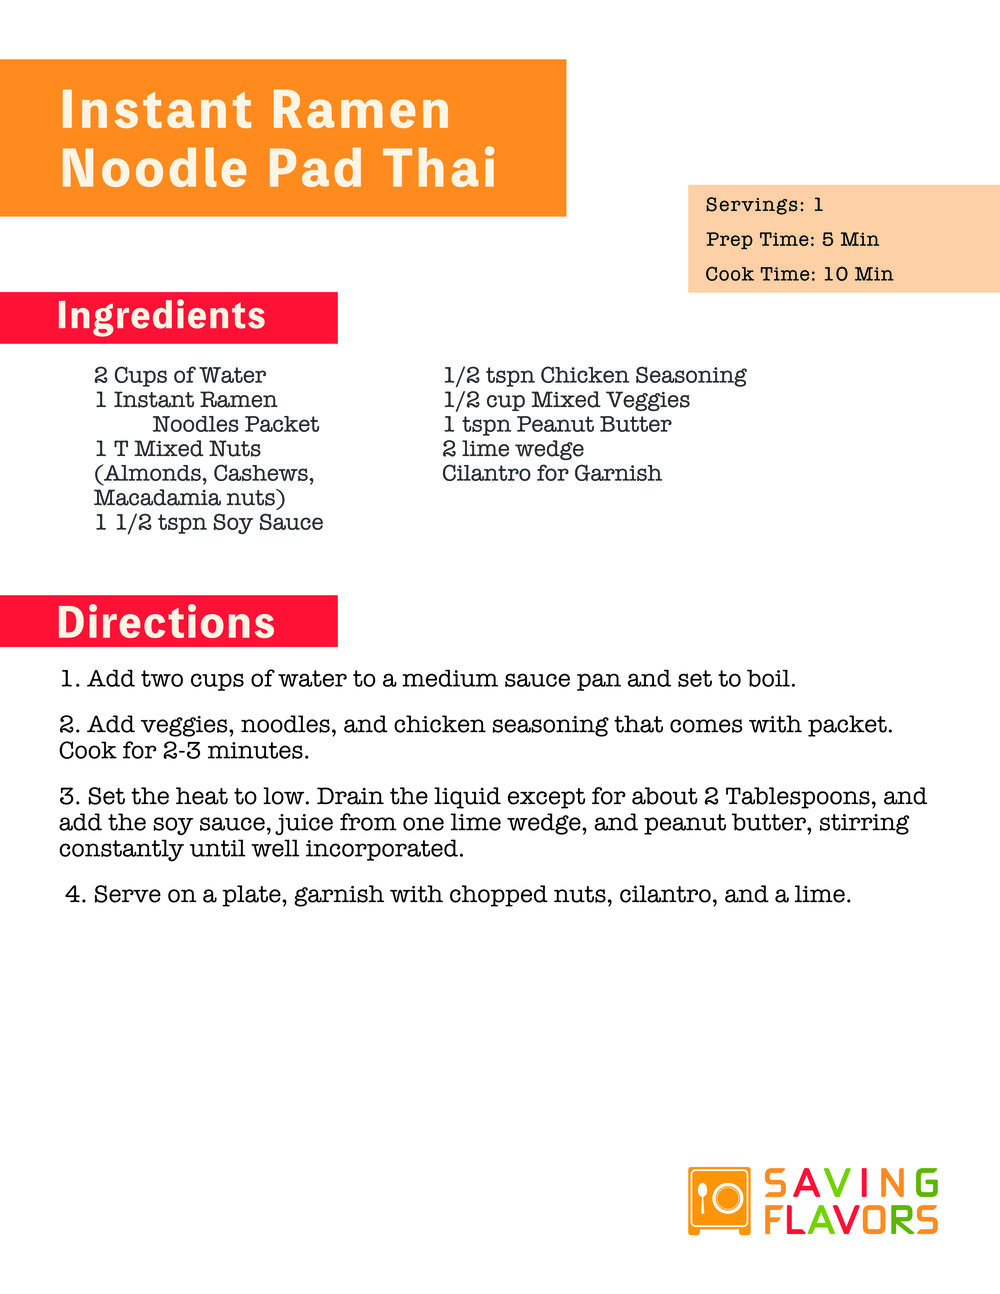 Print The Recipe